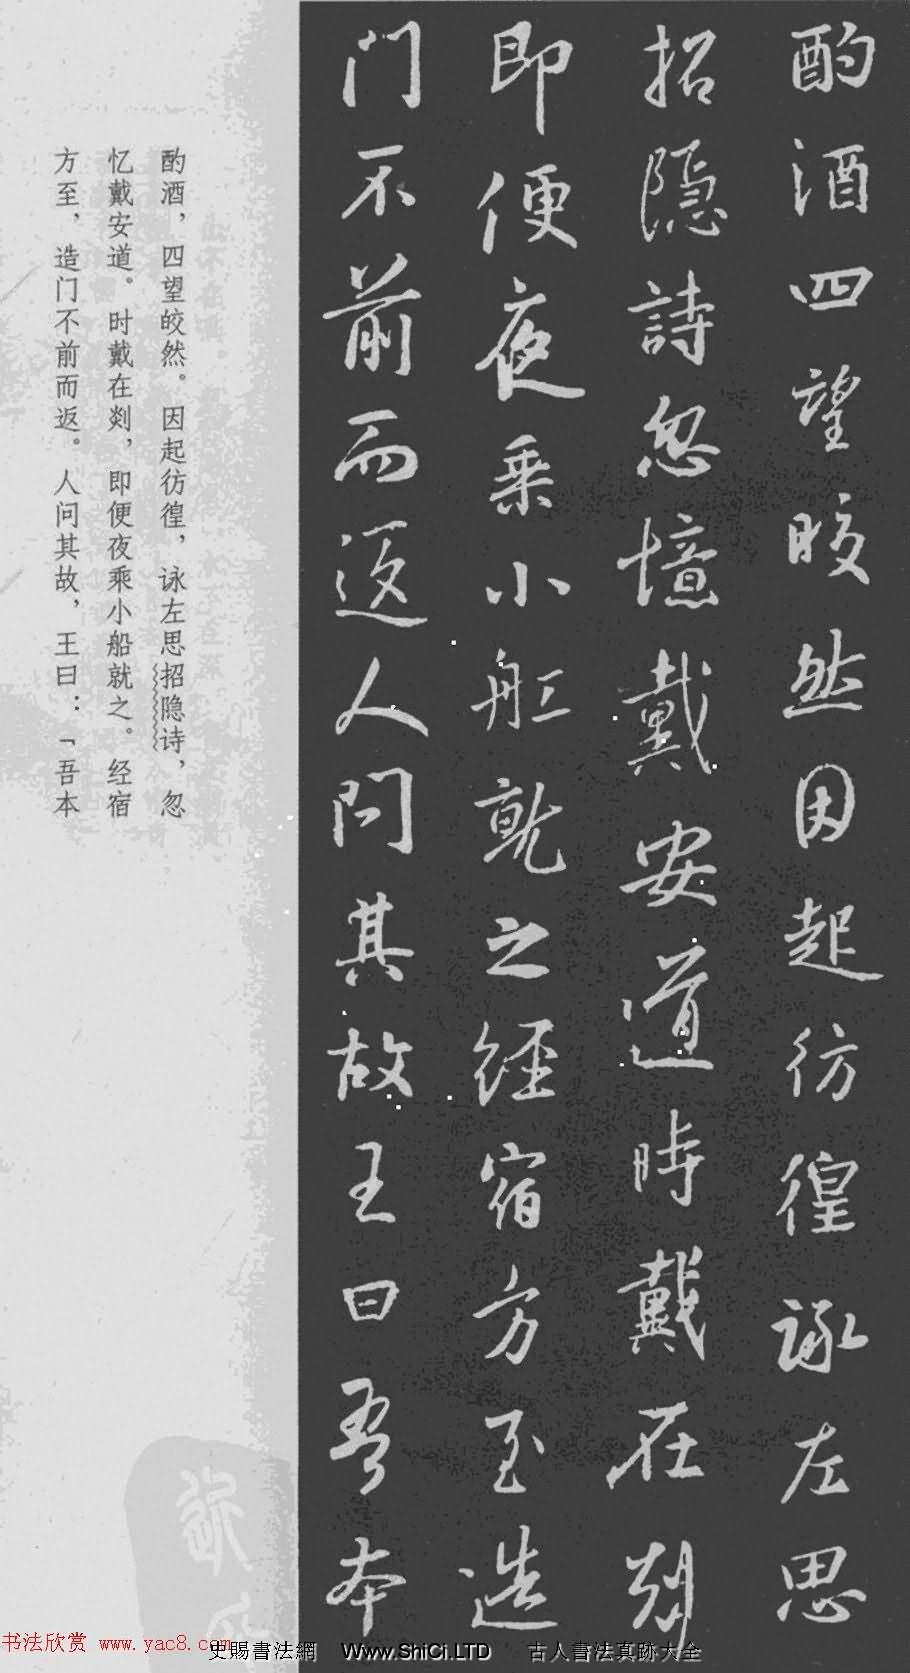 王羲之行書集の字「世説新語+陋室銘」(全部で5枚の写真)